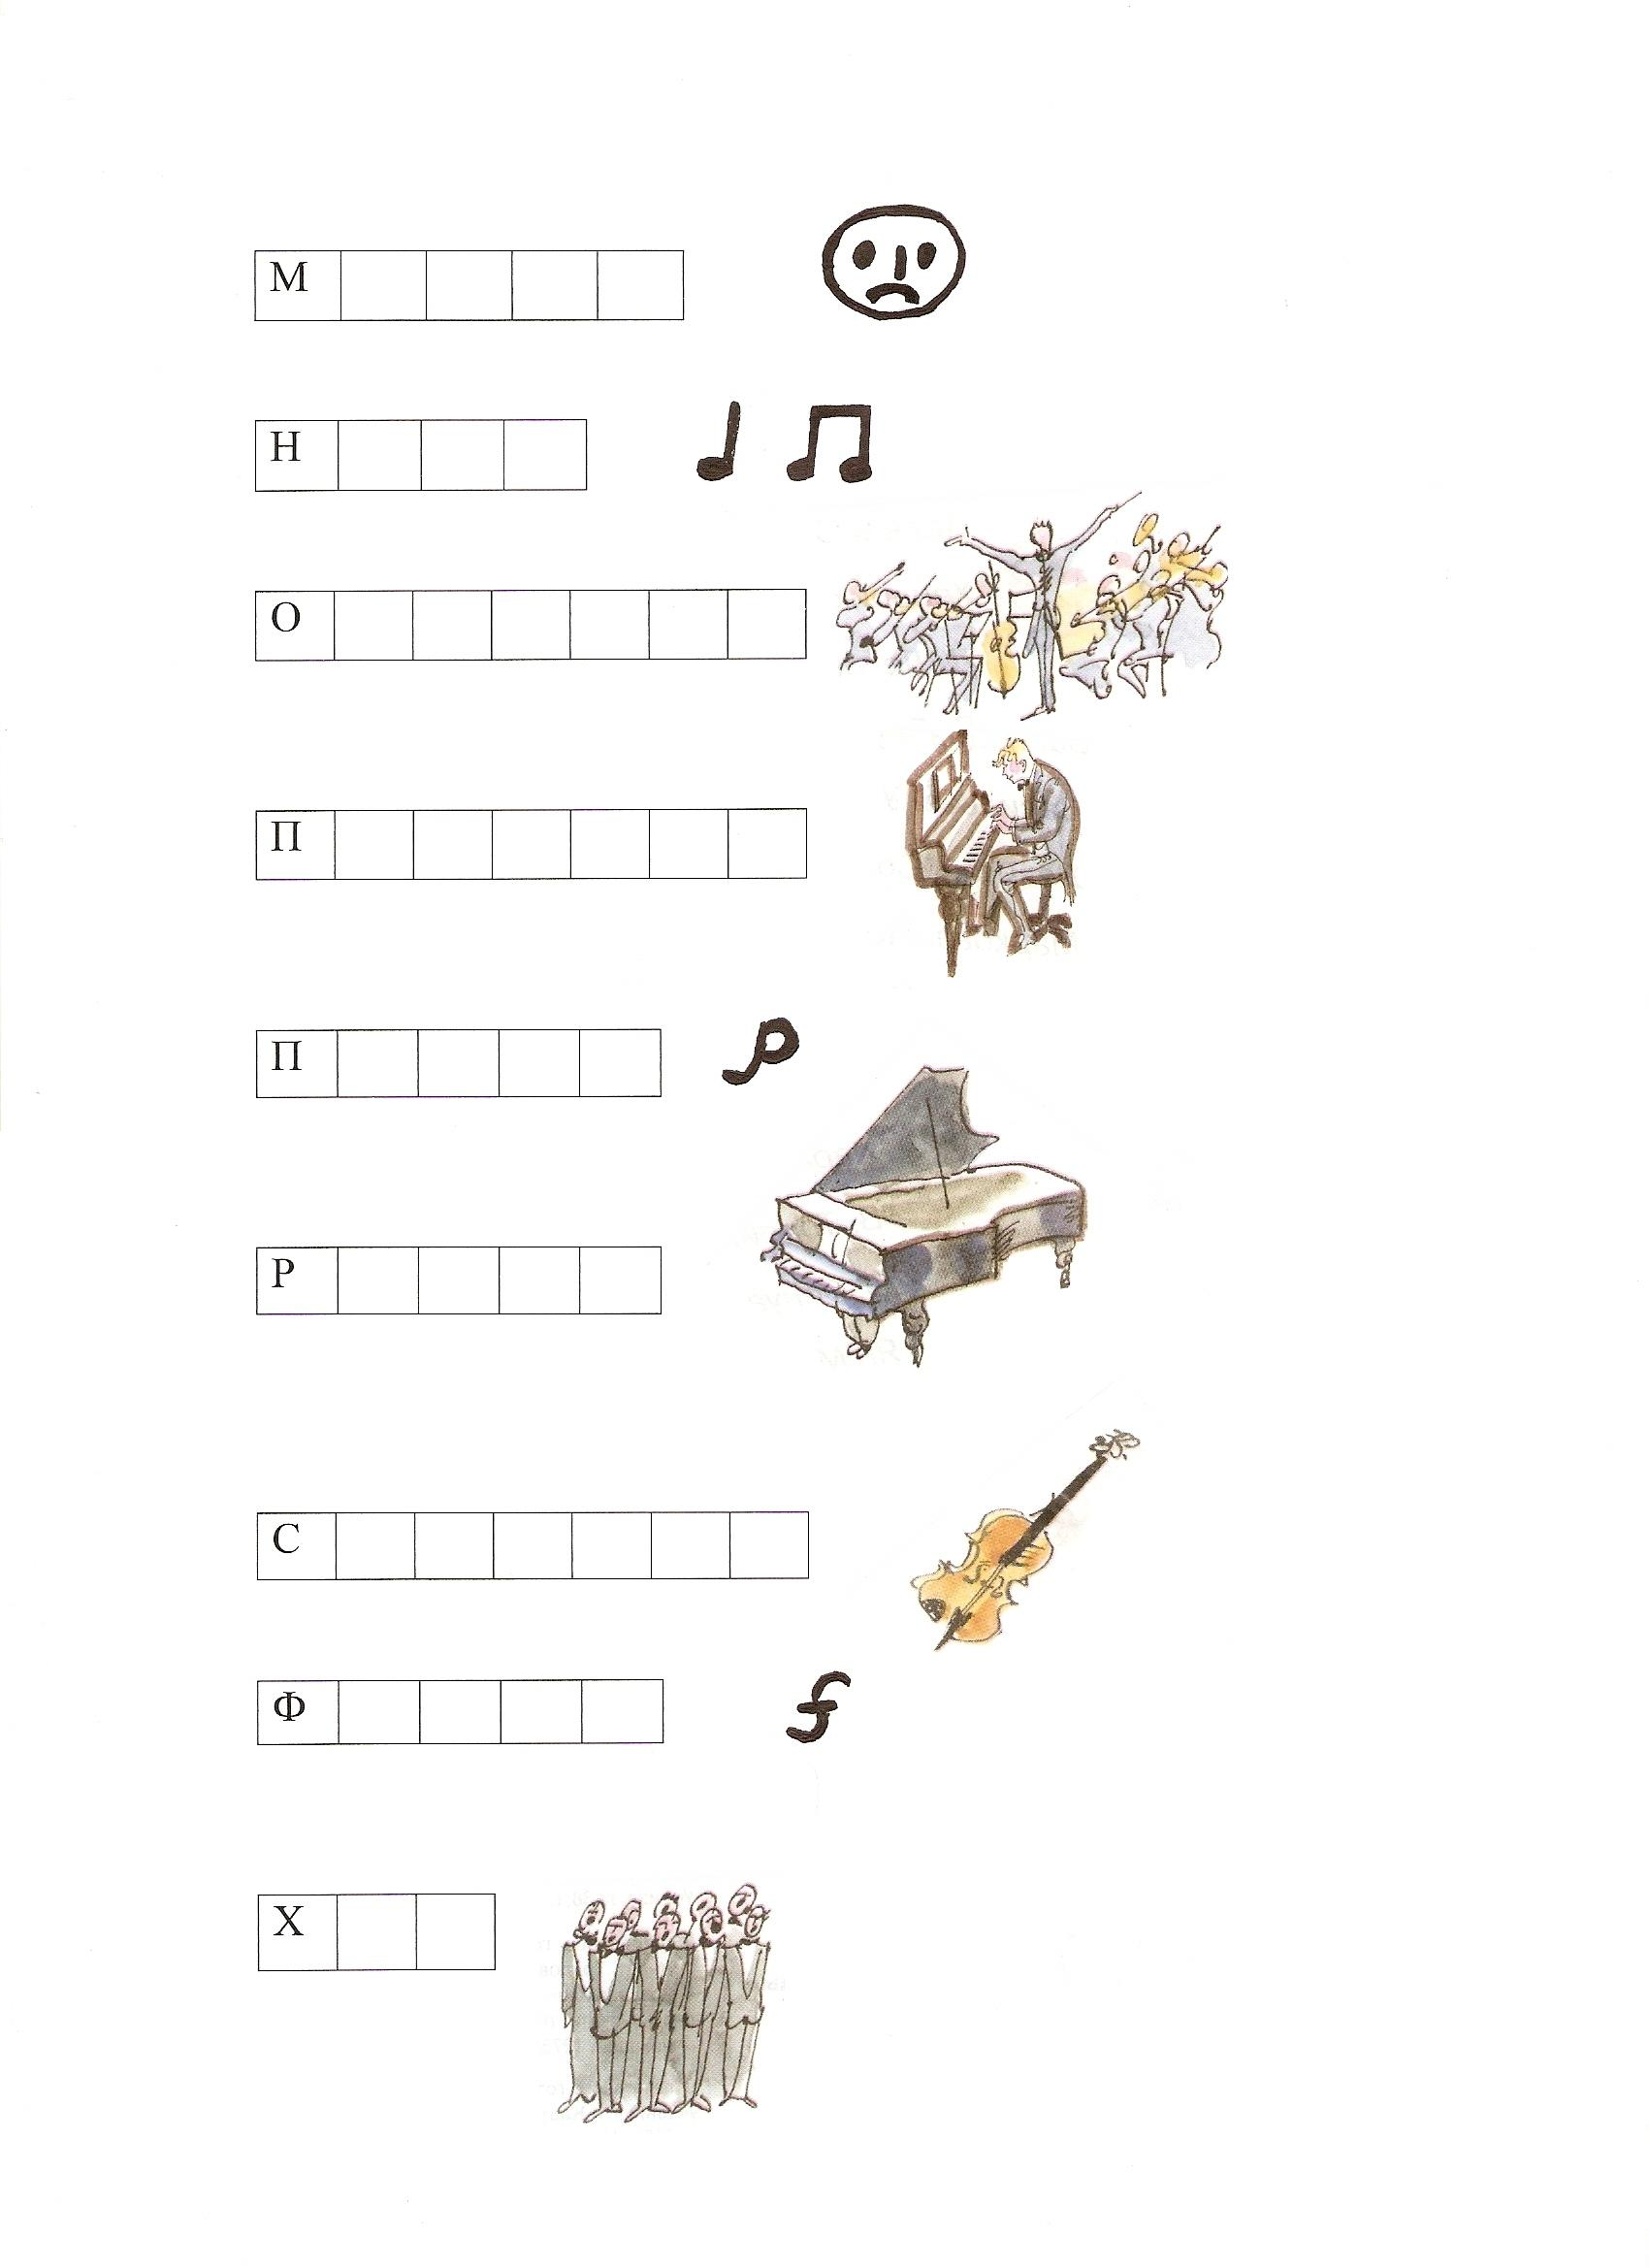 задание 6 домашнее по класс музыке